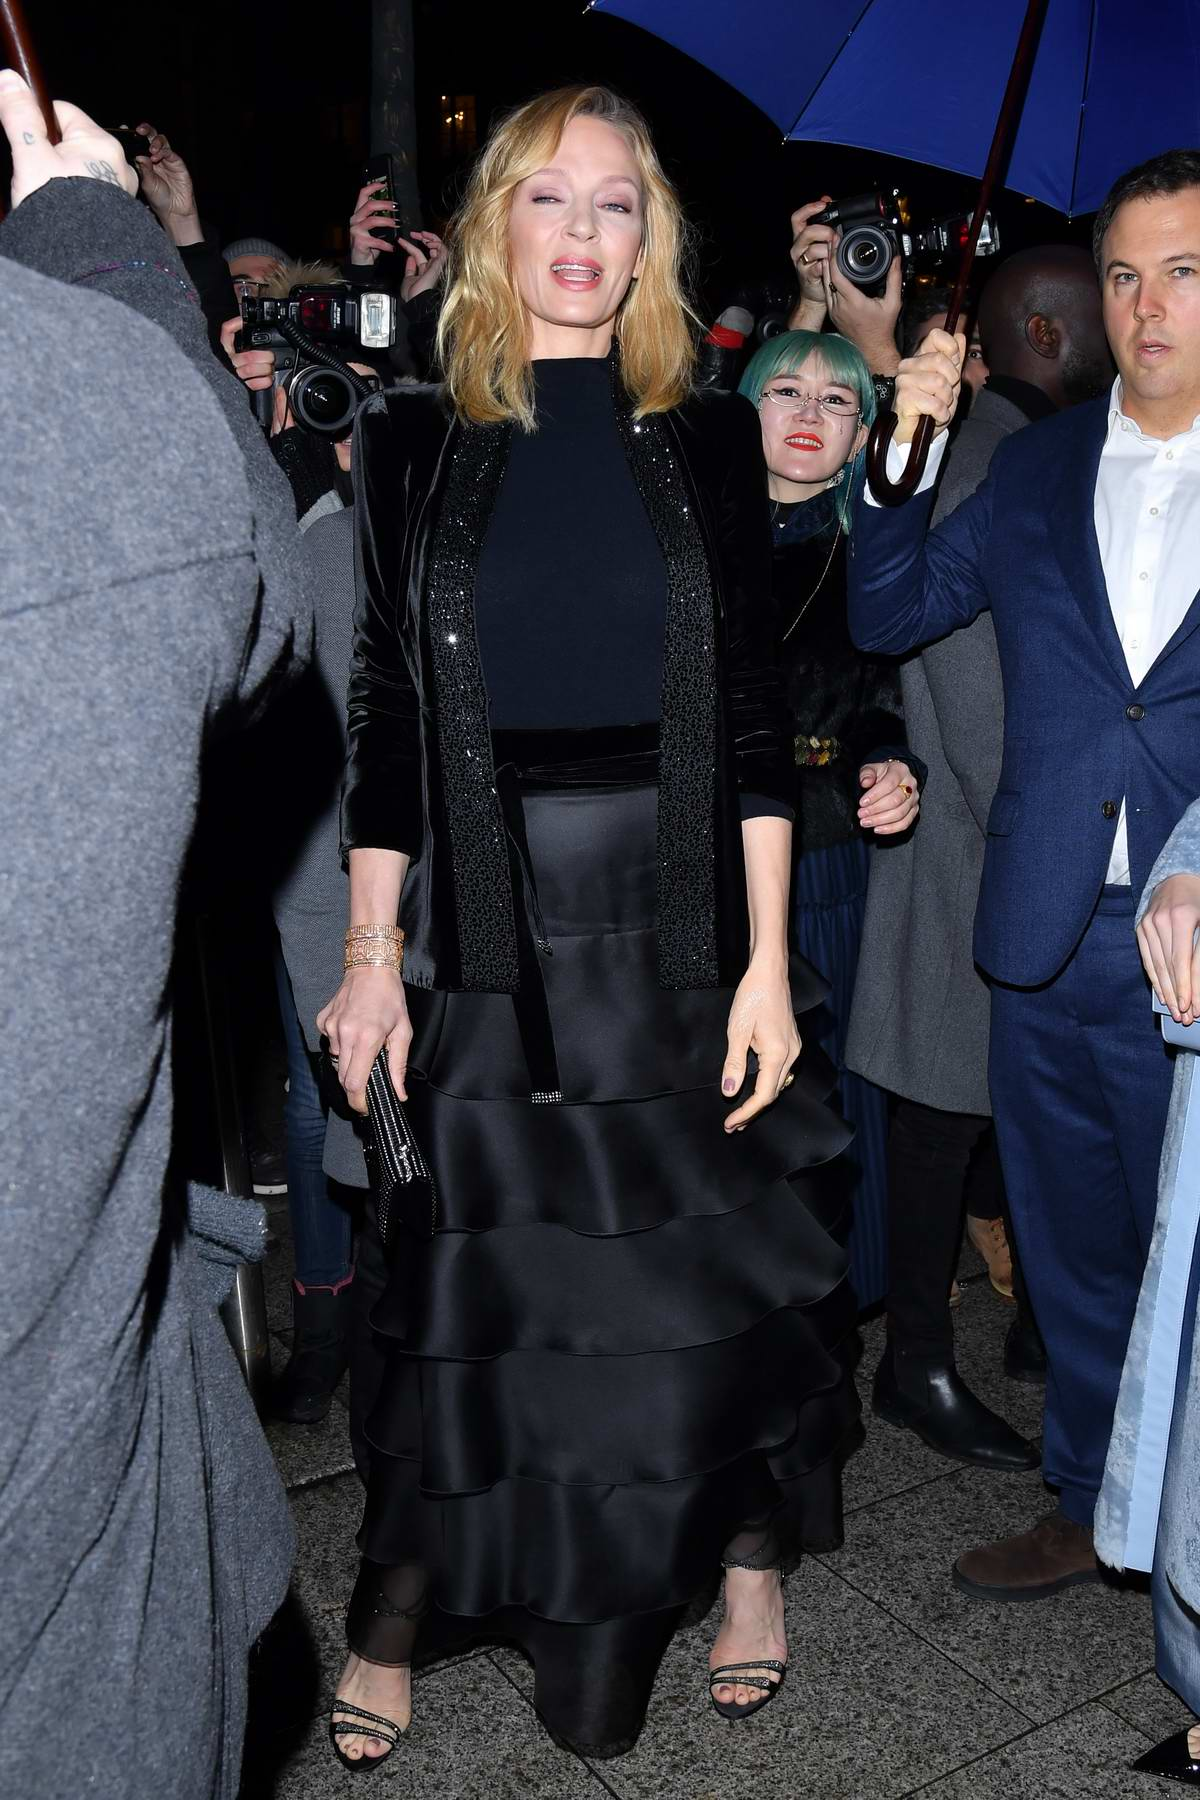 Uma Thurman attends the Giorgio Armani Privé Haute Couture Spring/Summer 2019 Show during Paris Fashion Week in Paris, France